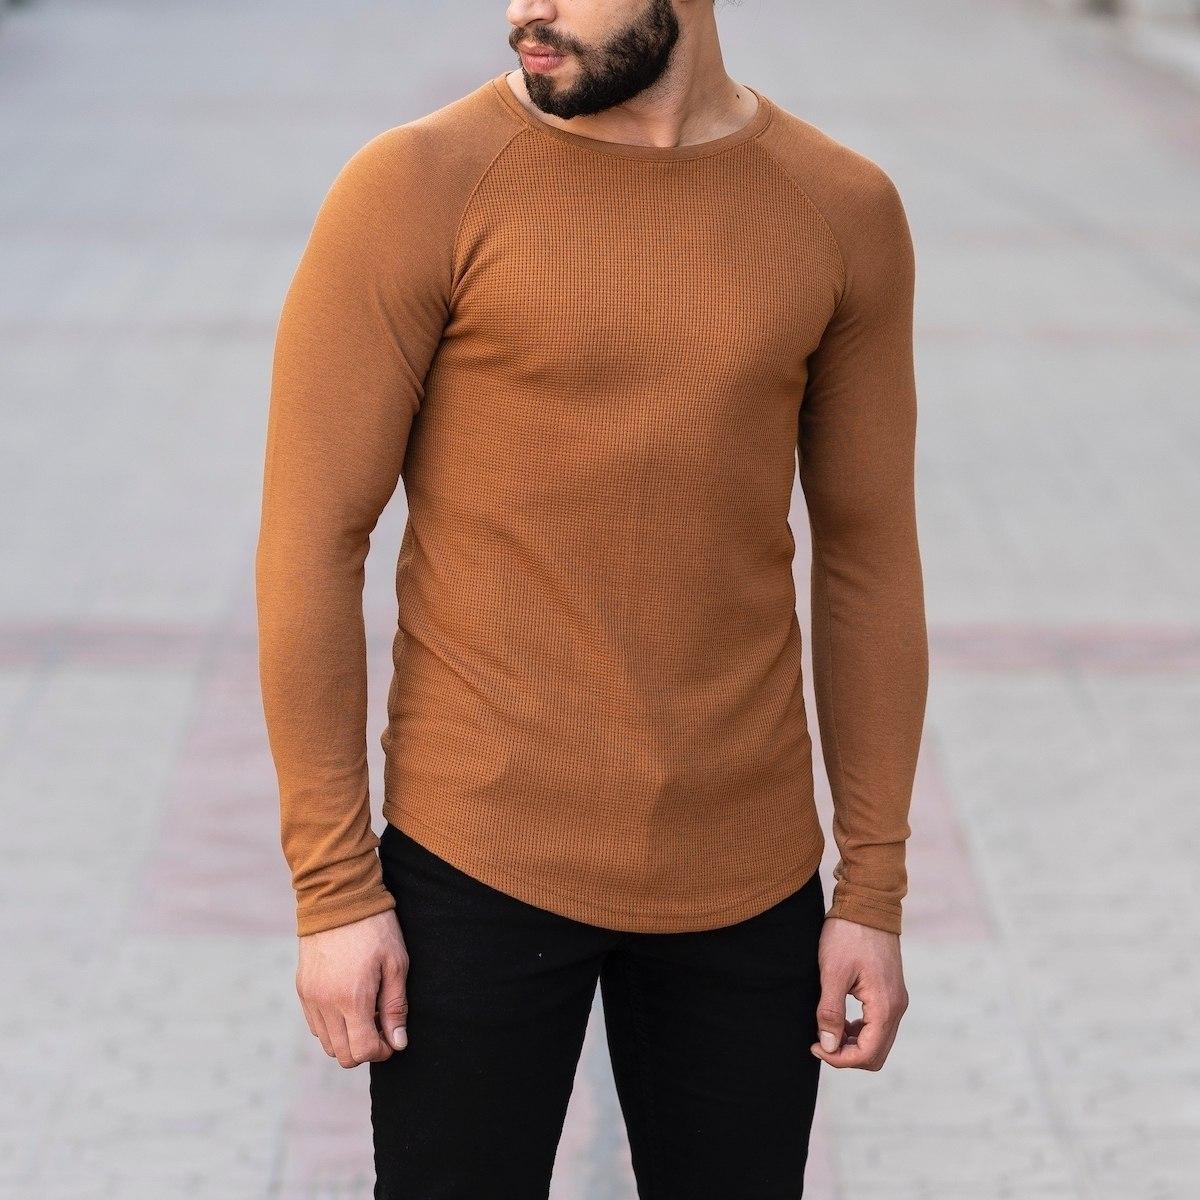 Dotwork Sweatshirt In Brown